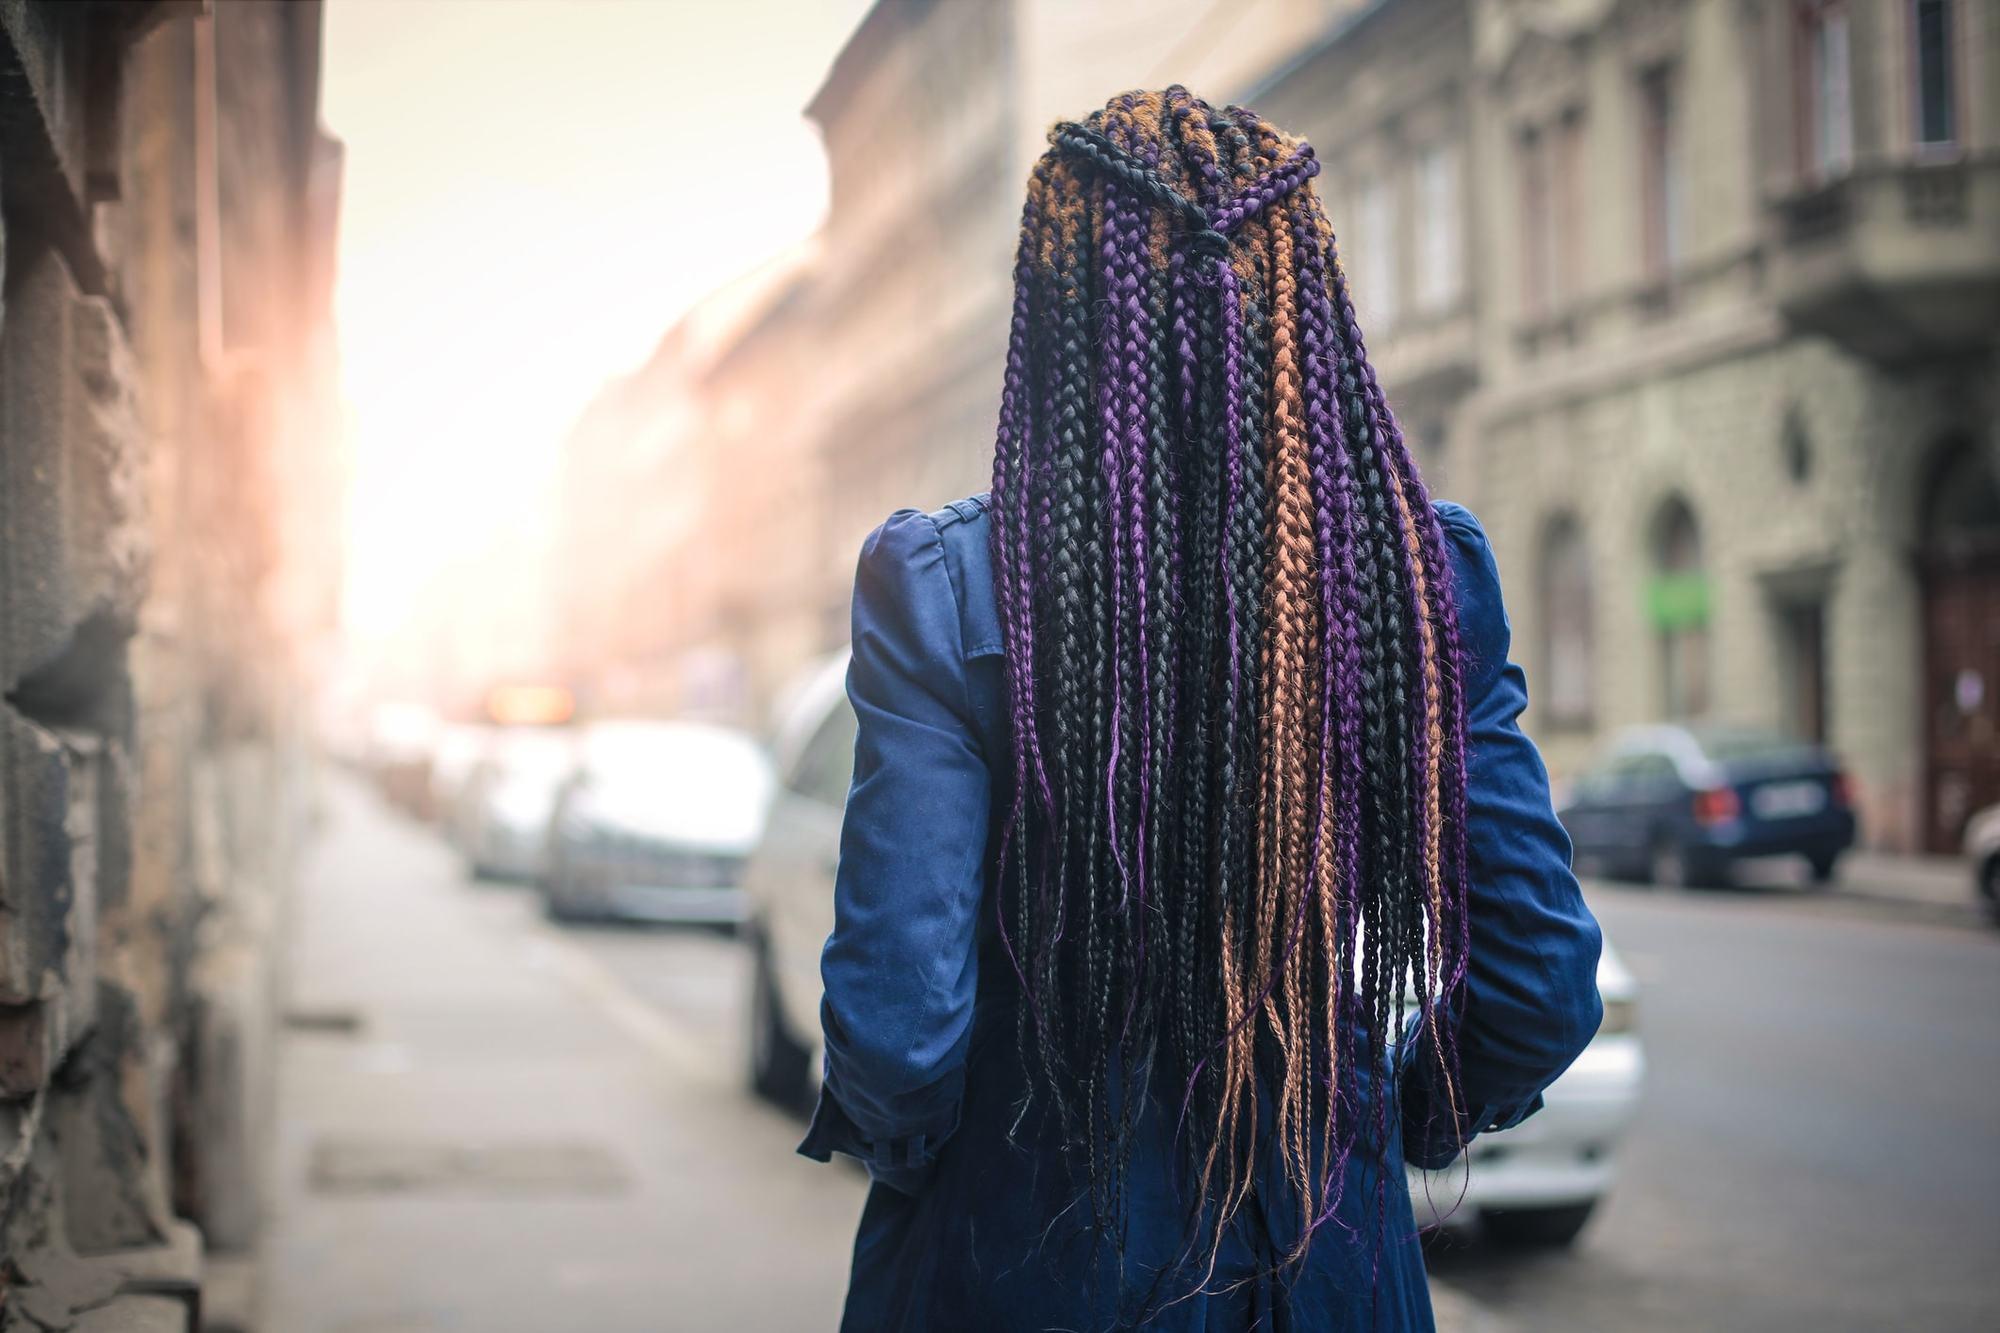 pretty braids gold purple tied up